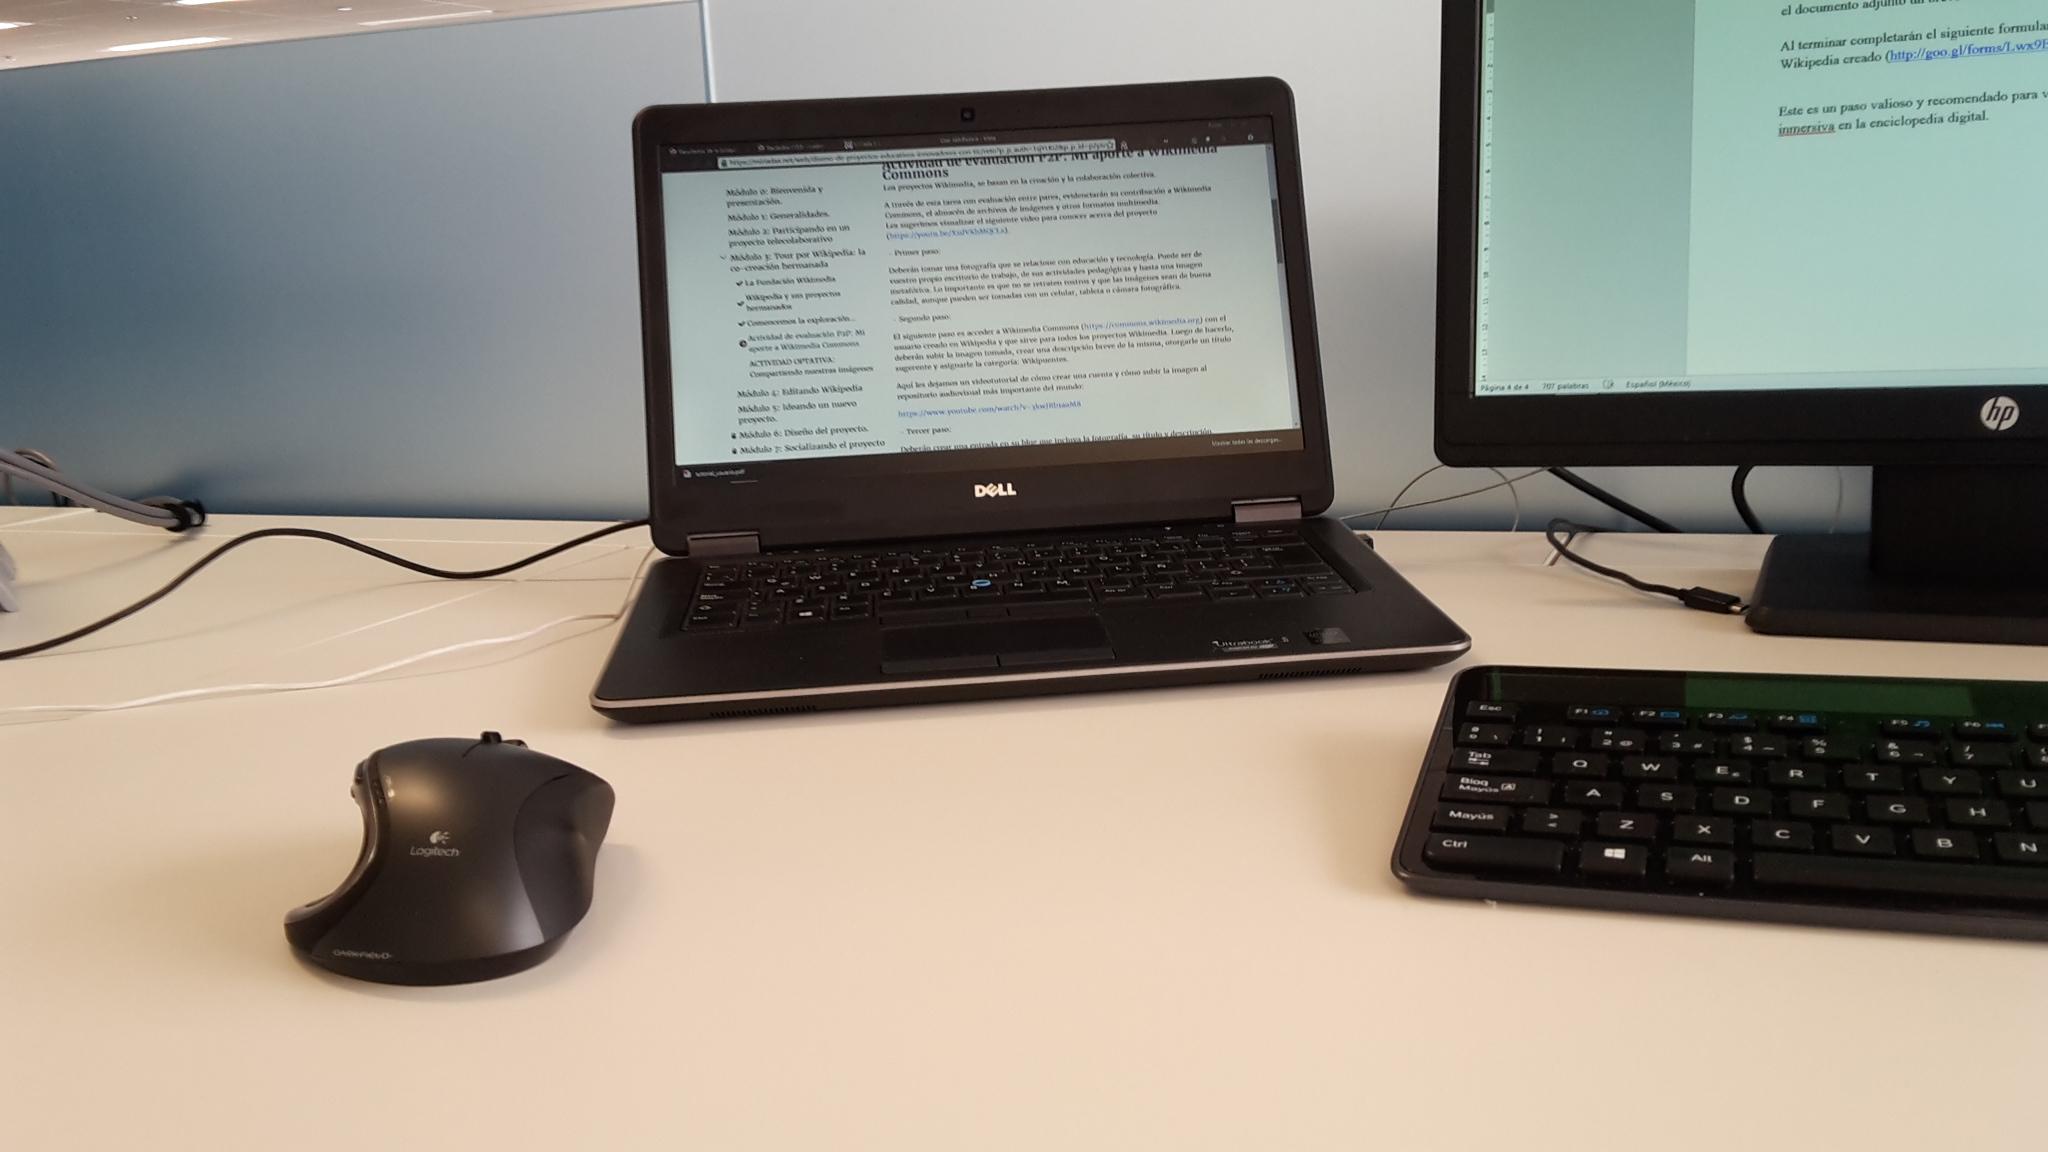 File mi escritorio de wikimedia commons - Escritorio de trabajo ...